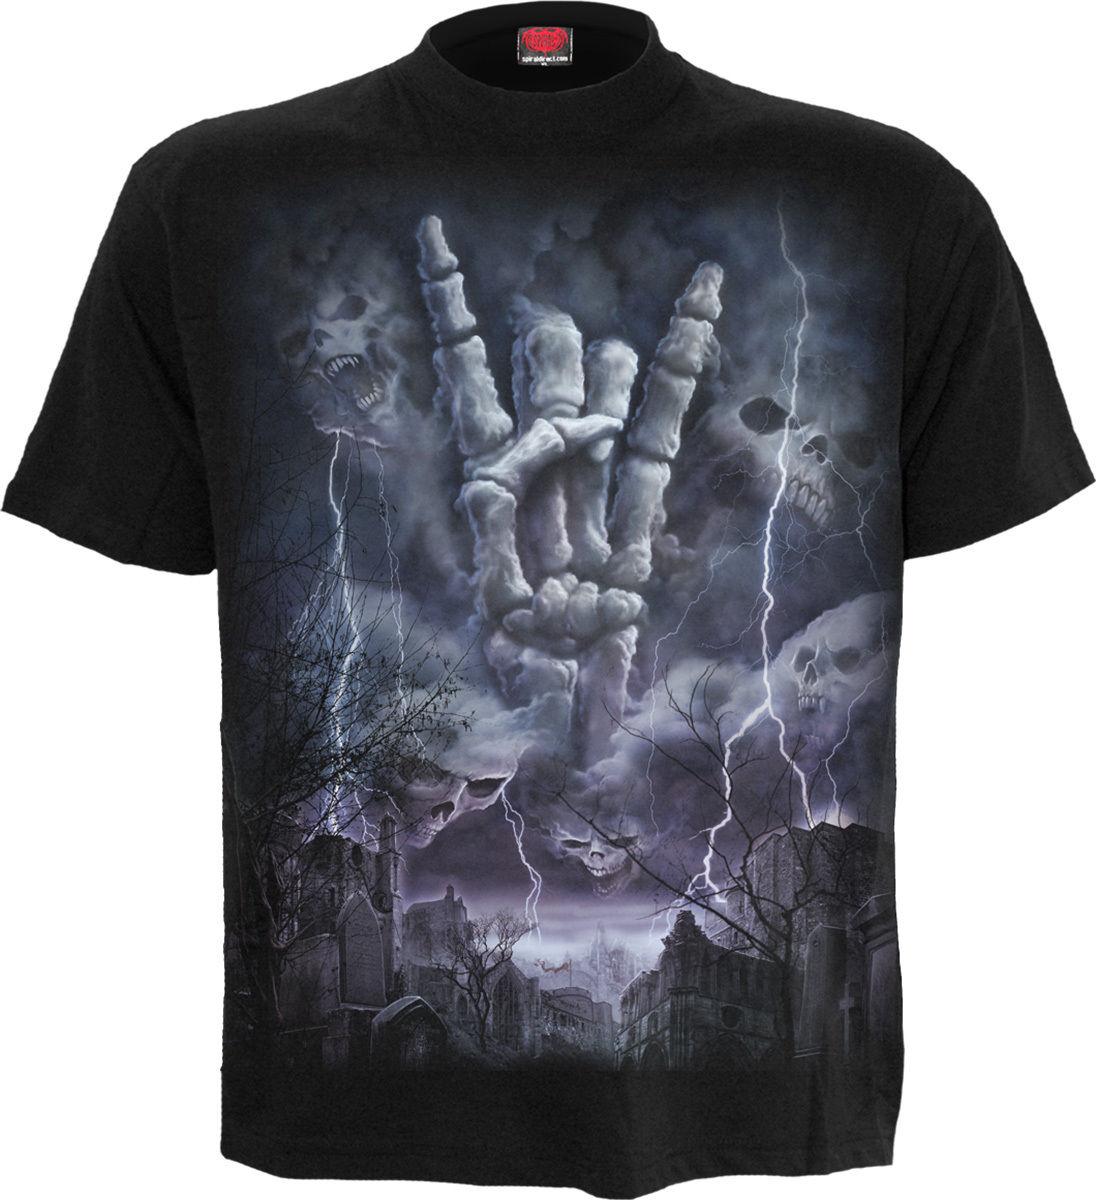 Biker Skulls Cross T-Shirt Clothing Spiral Direct BLEEDING SOULS Mens Metal